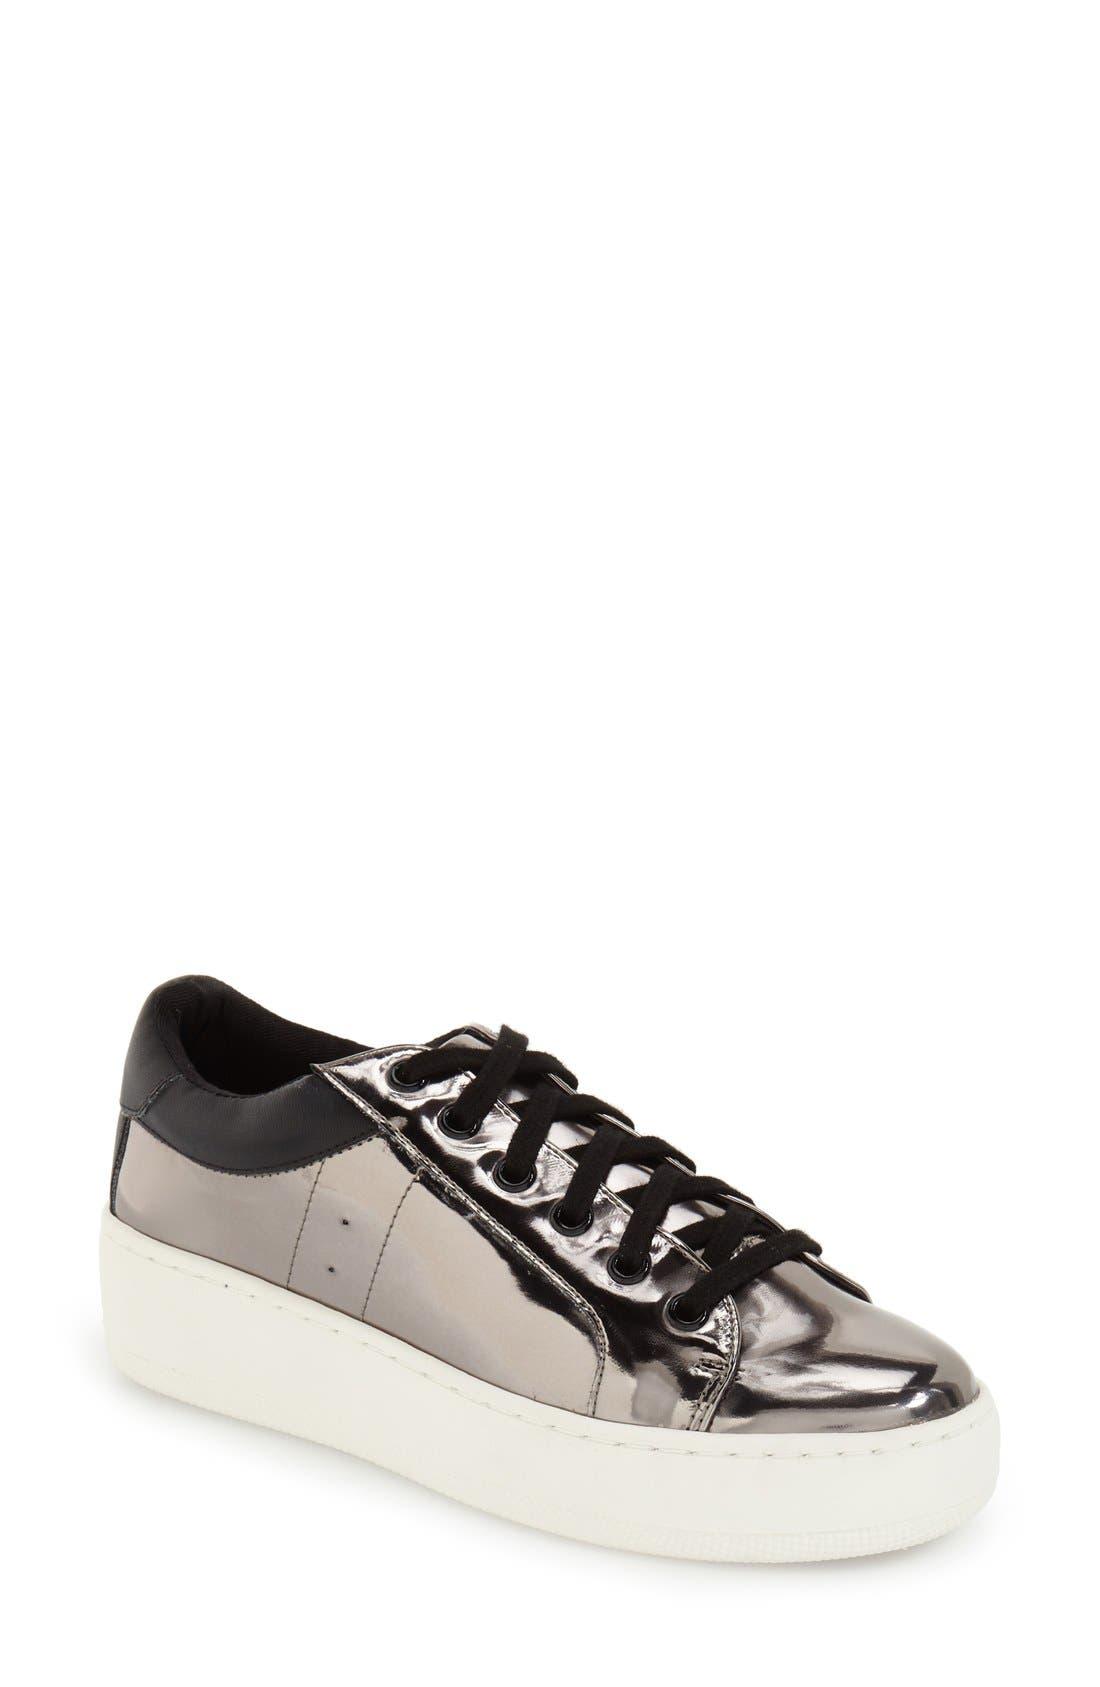 Alternate Image 1 Selected - Steve Madden Bertie Metallic Platform Sneaker (Women)